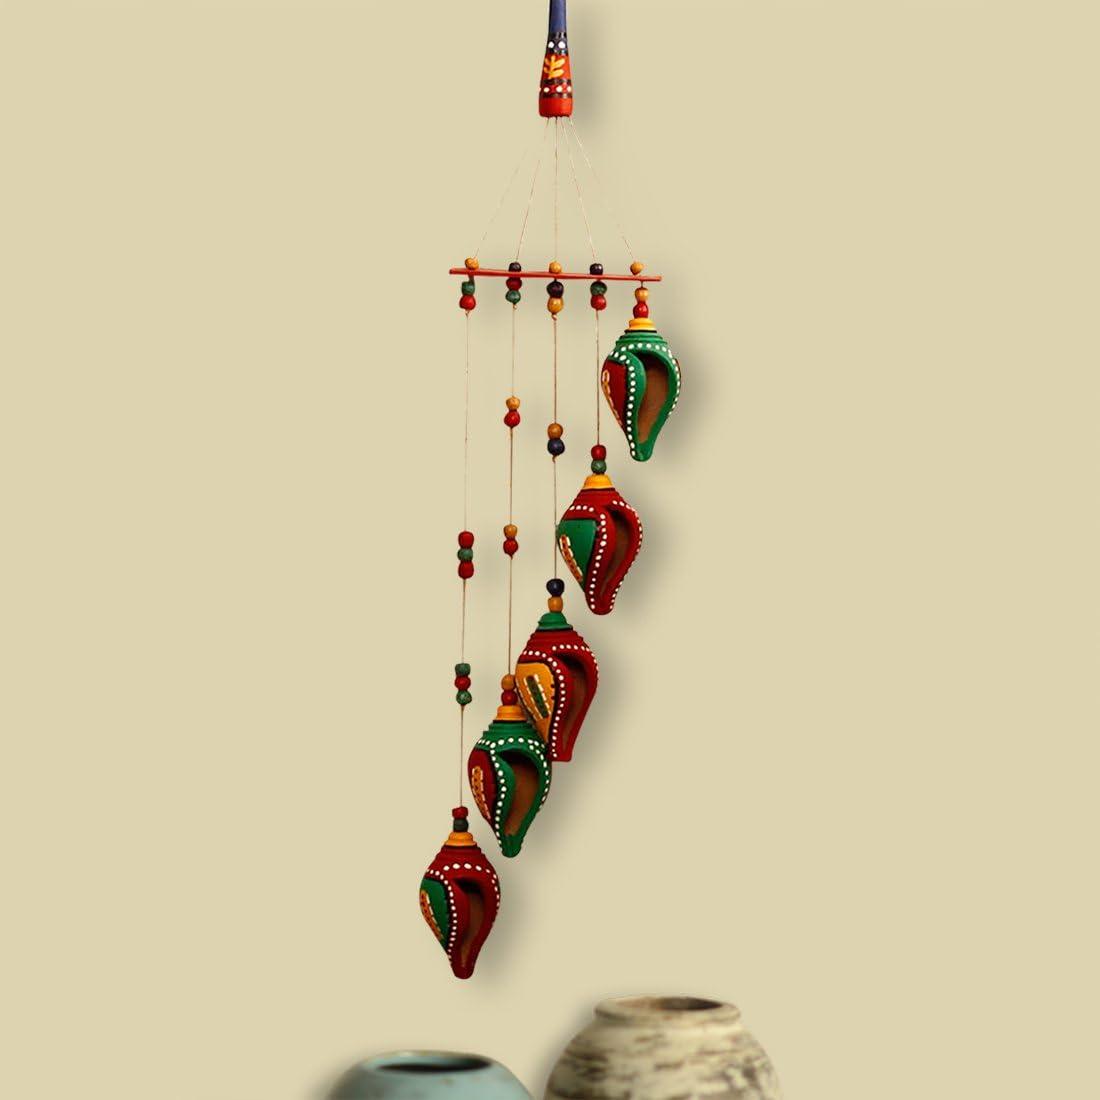 Free shipping ExclusiveLane 'A Shankh Bouquet' Handpainted Decorative Hanging Sacramento Mall